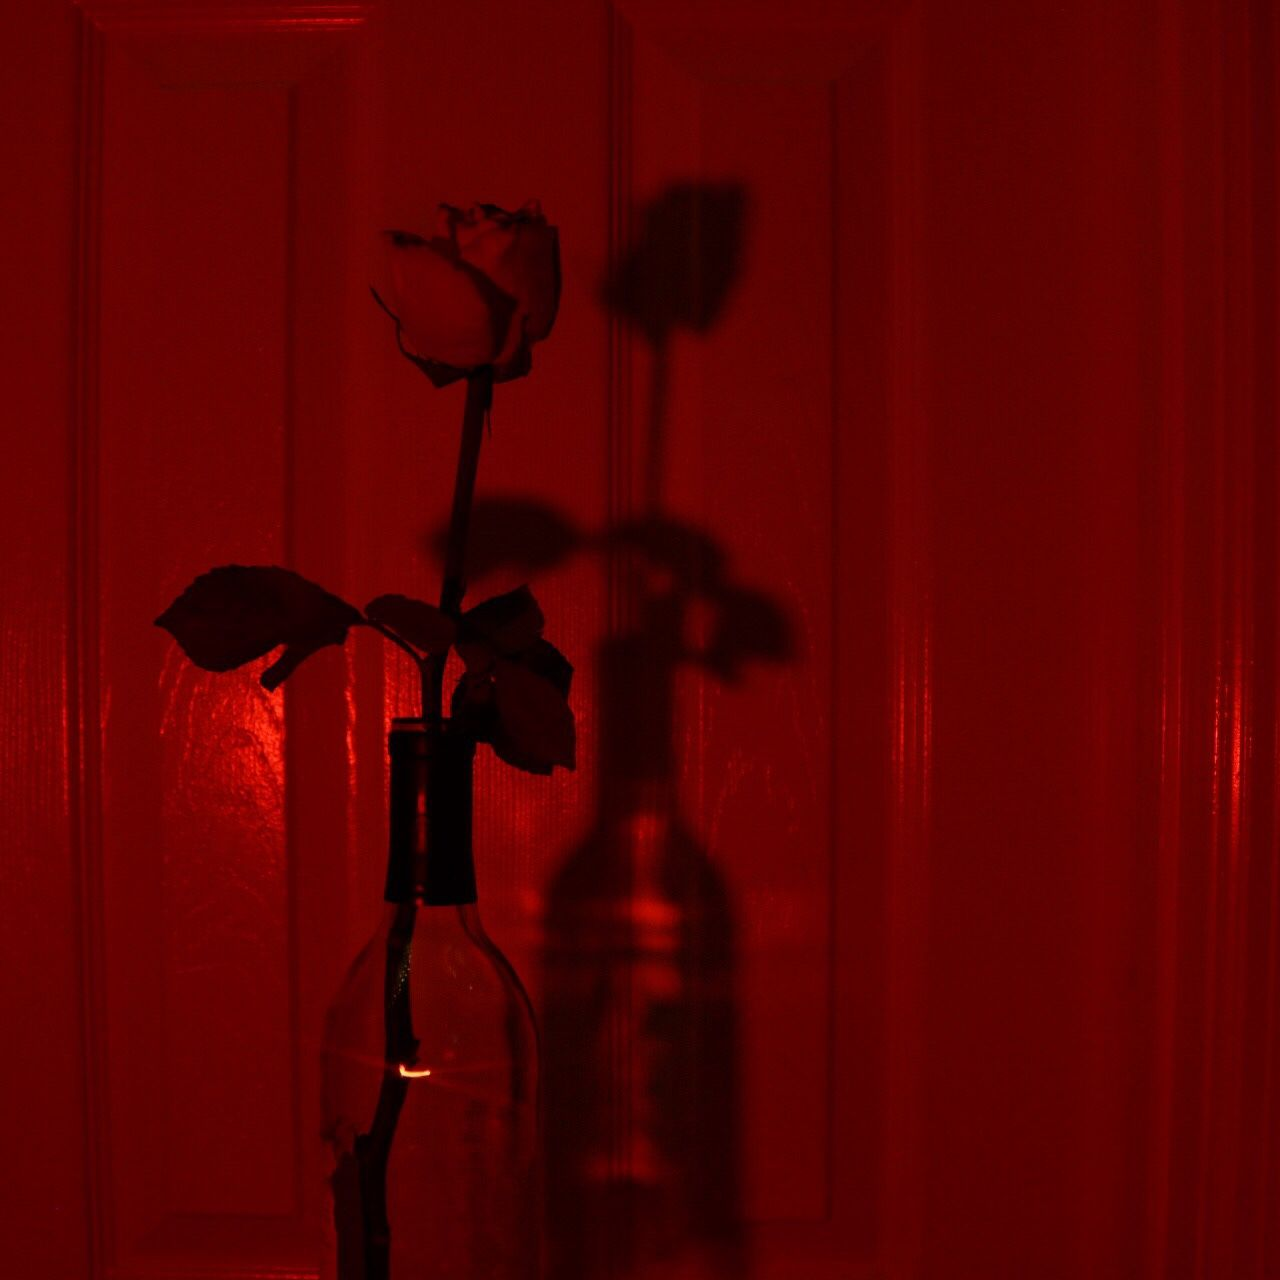 new post on eslamy curvy fashion tumblr red aesthetic. Black Bedroom Furniture Sets. Home Design Ideas